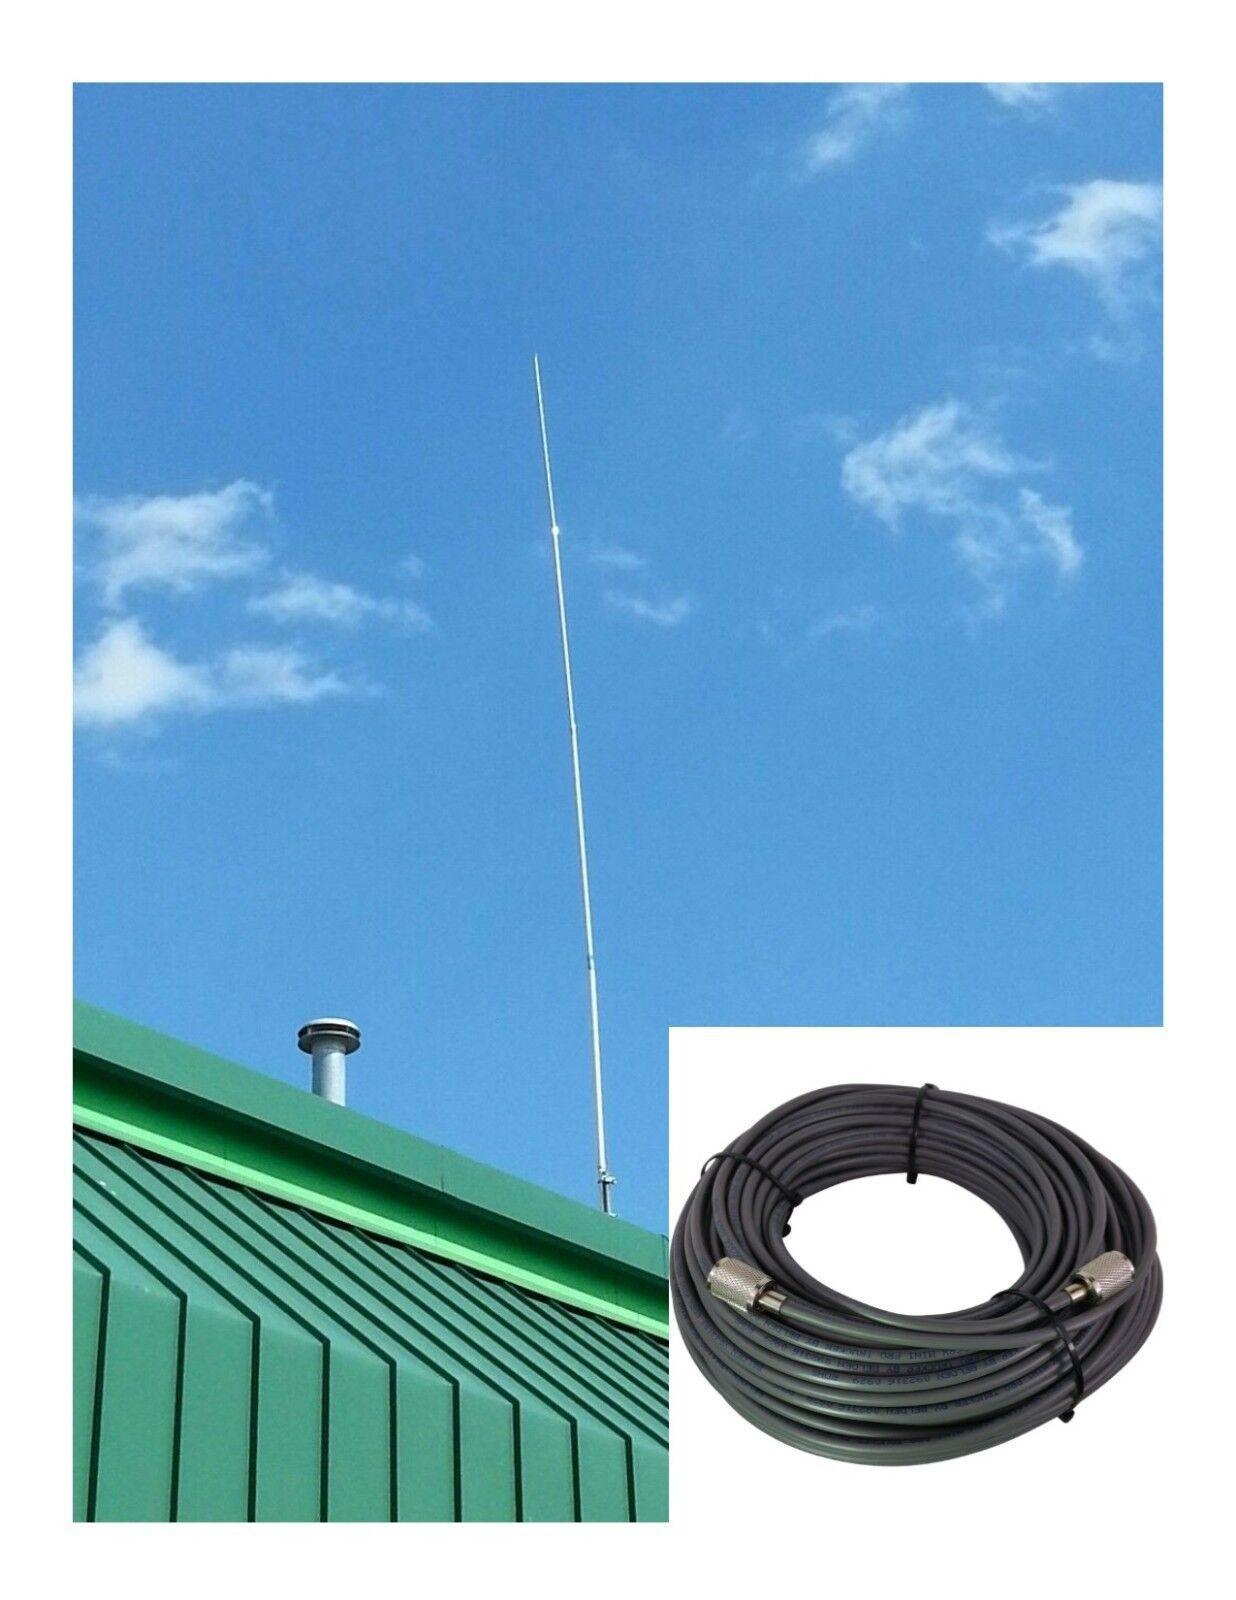 Pt99 ProComm Proton CB Ham Base Antenna & 50 FT Rg8x Coax Cable 95 ...